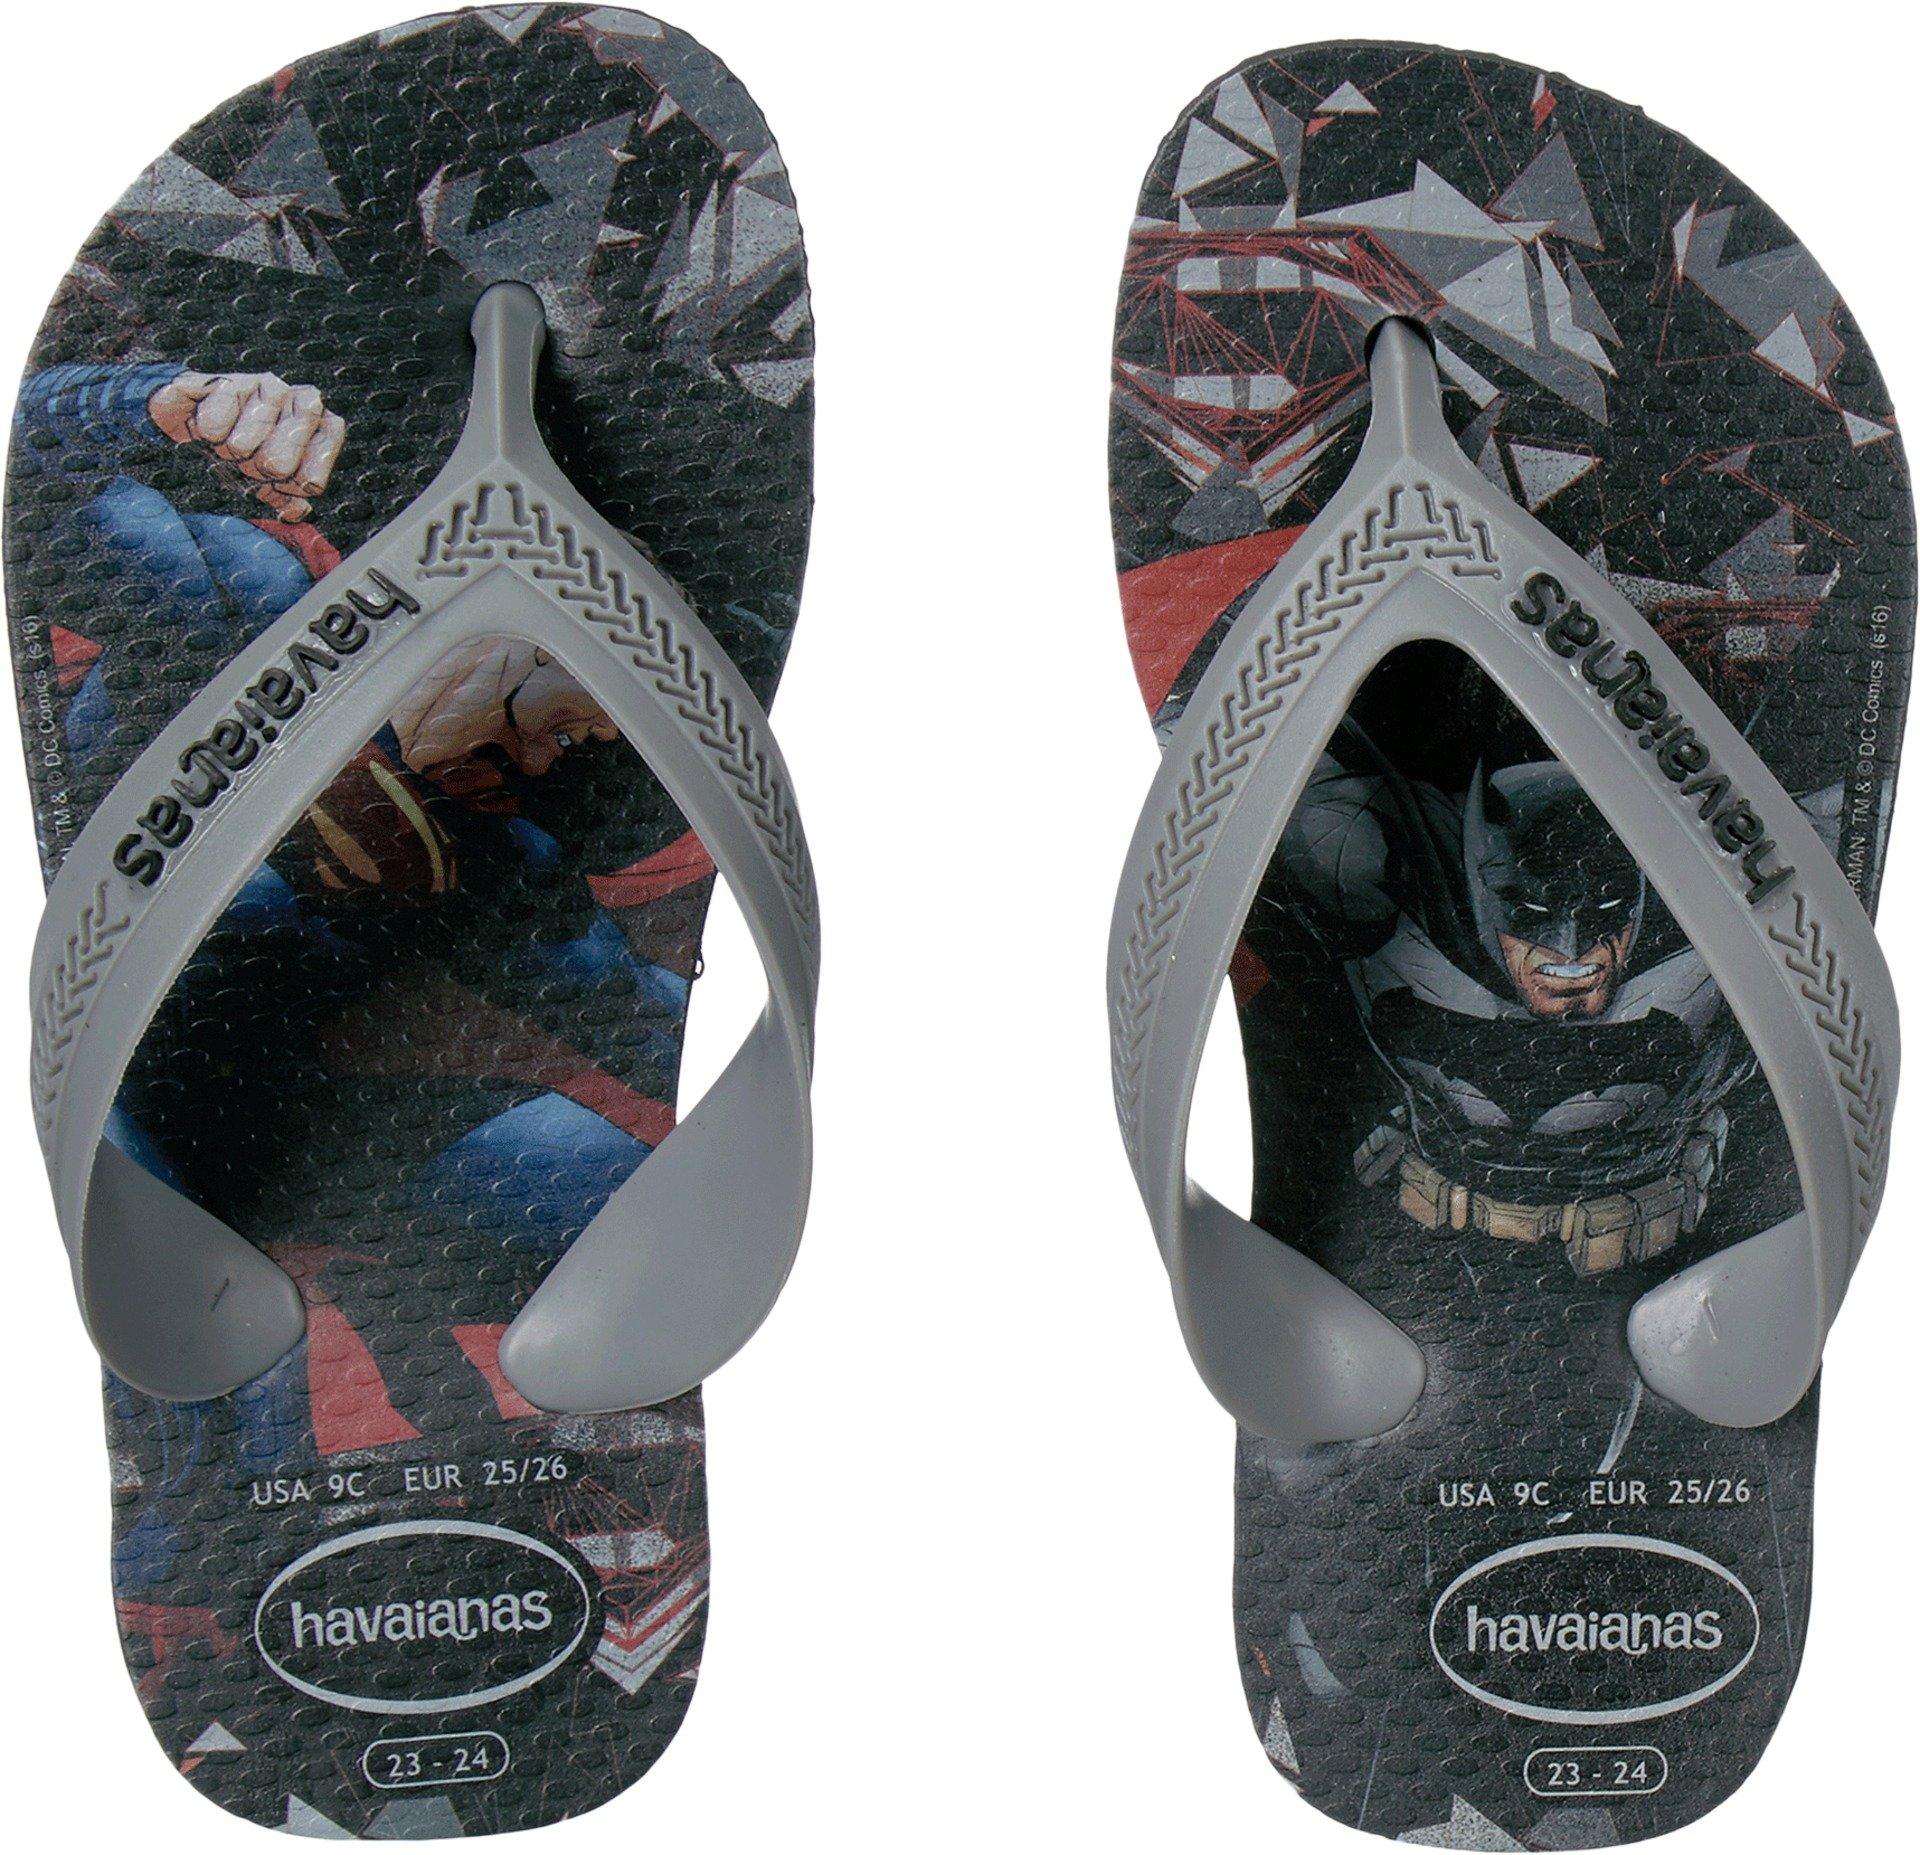 Havaianas Boys Flip Flop Sandals, Kids Max Heroes, Batman vs Superman,Black,25/26 BR (10 M US Toddler)